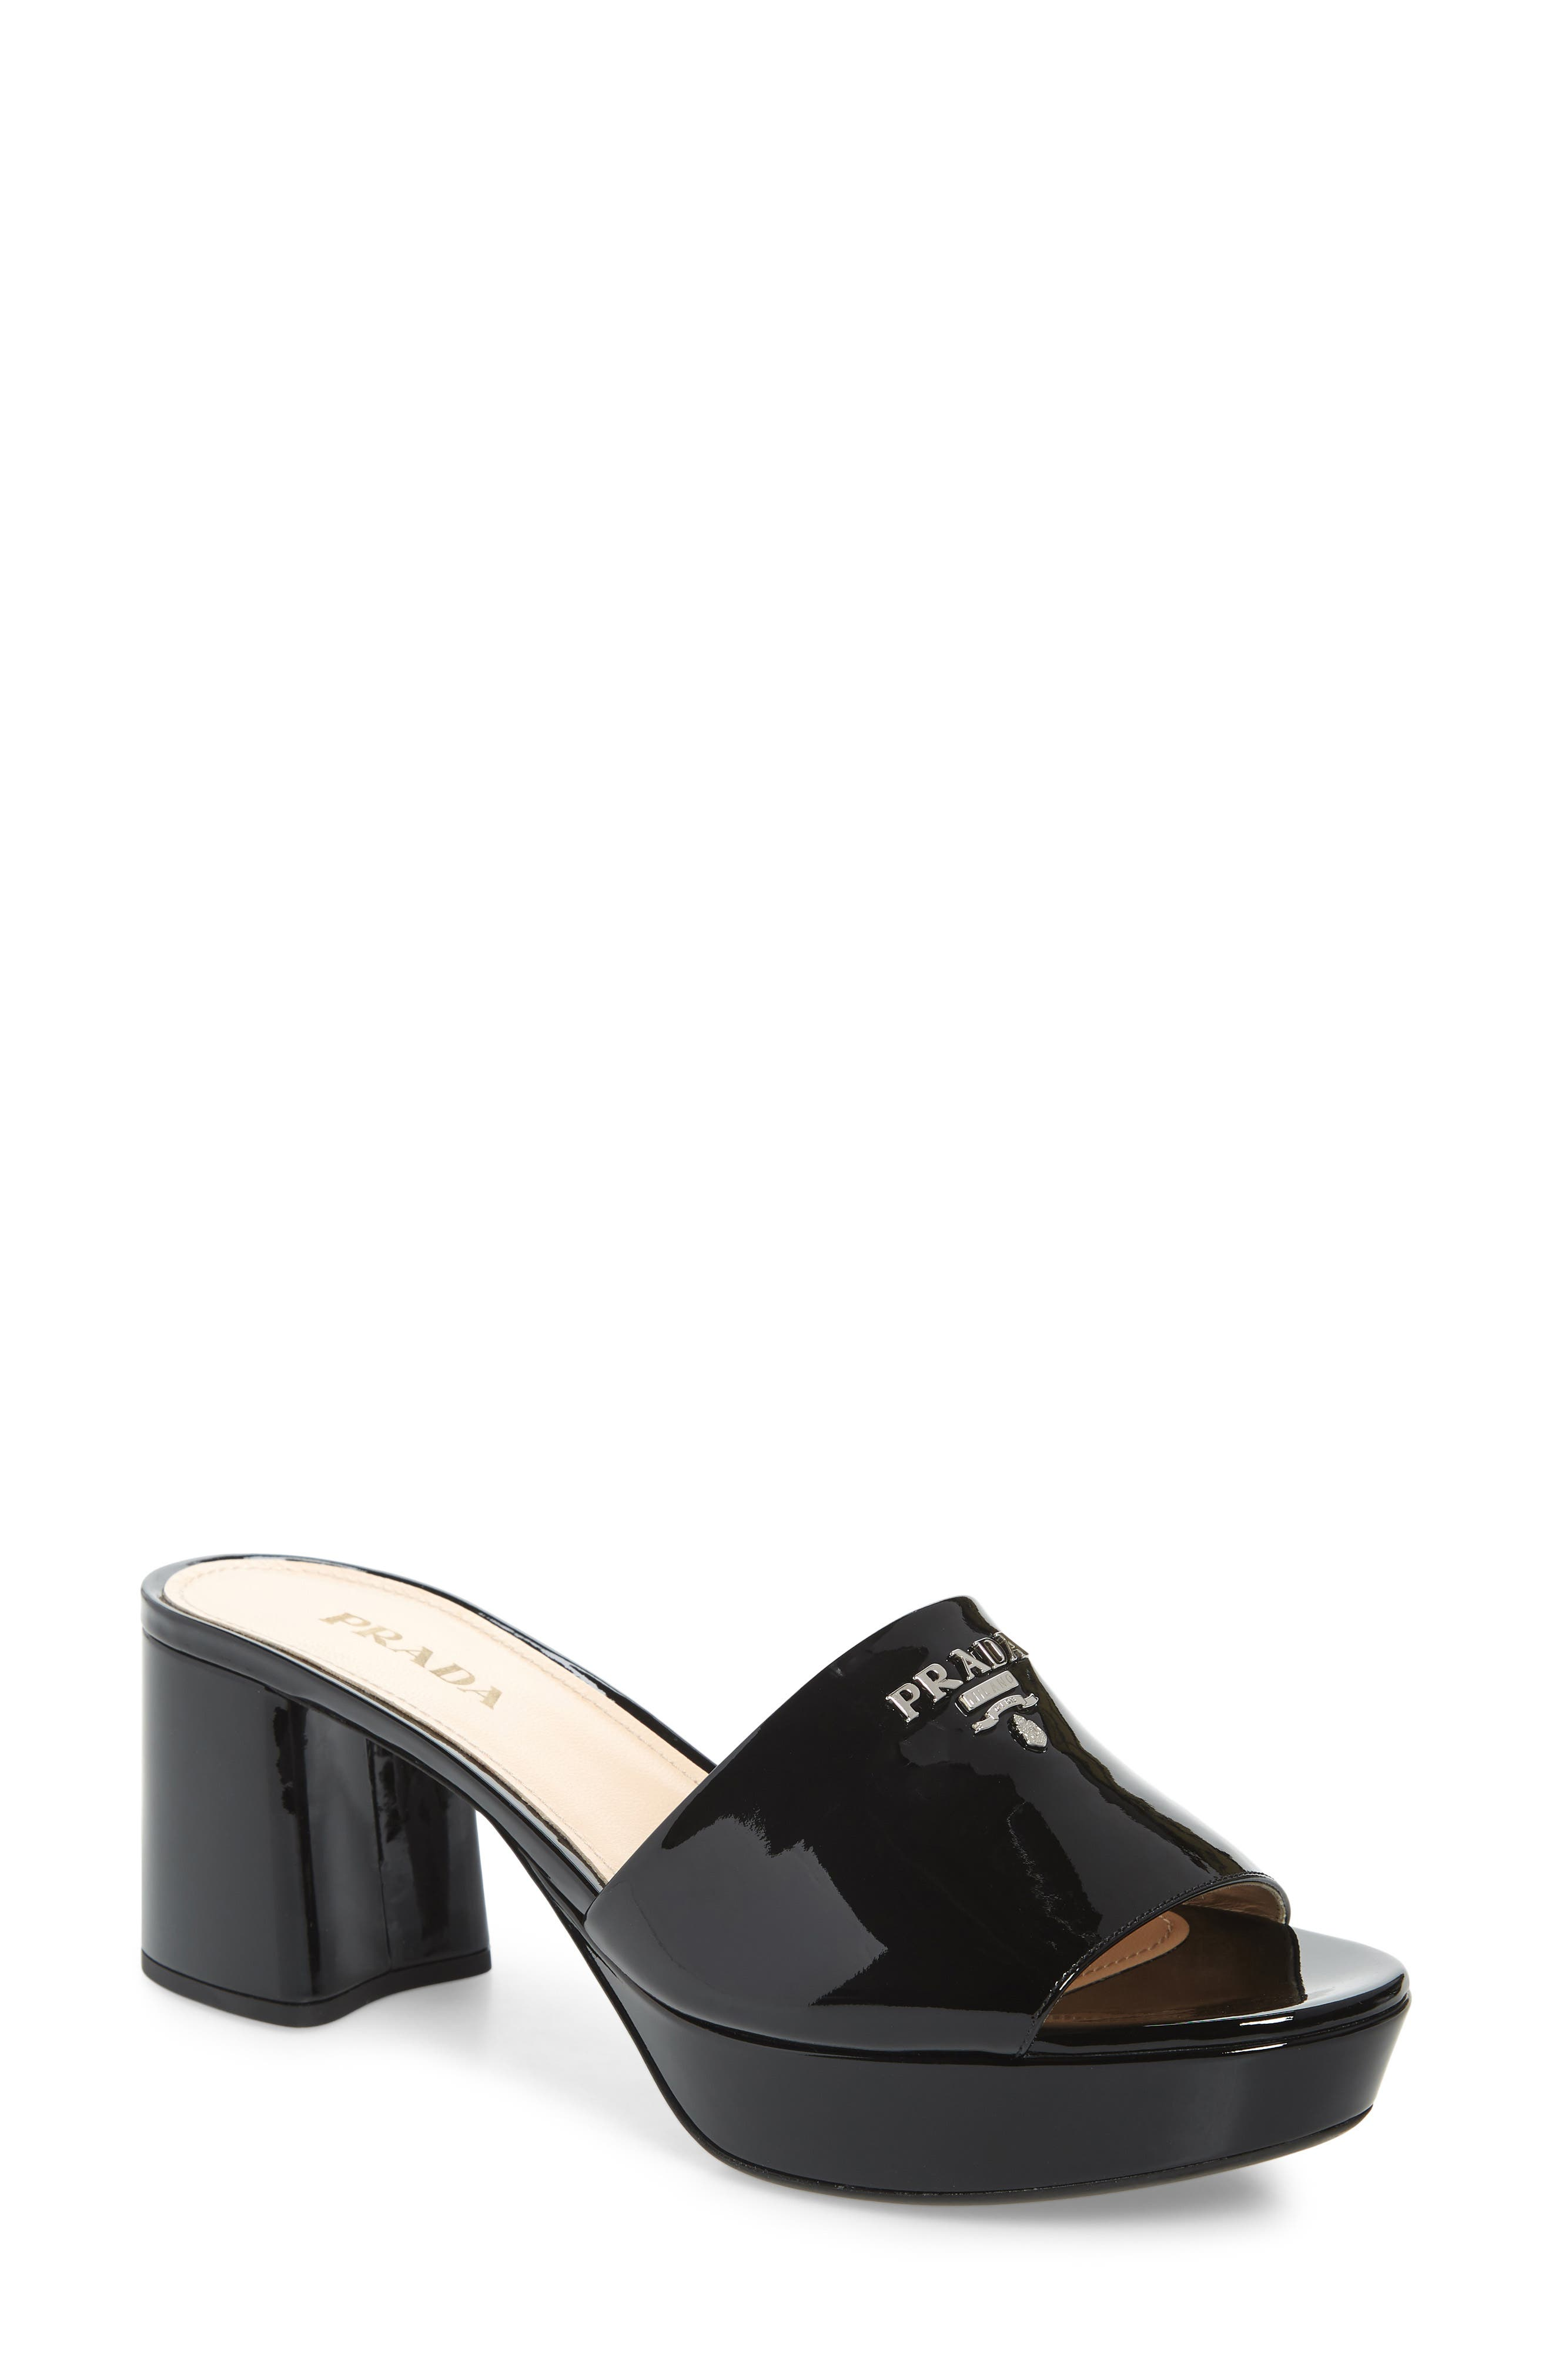 PRADA, Platform Slide Sandal, Main thumbnail 1, color, BLACK PATENT